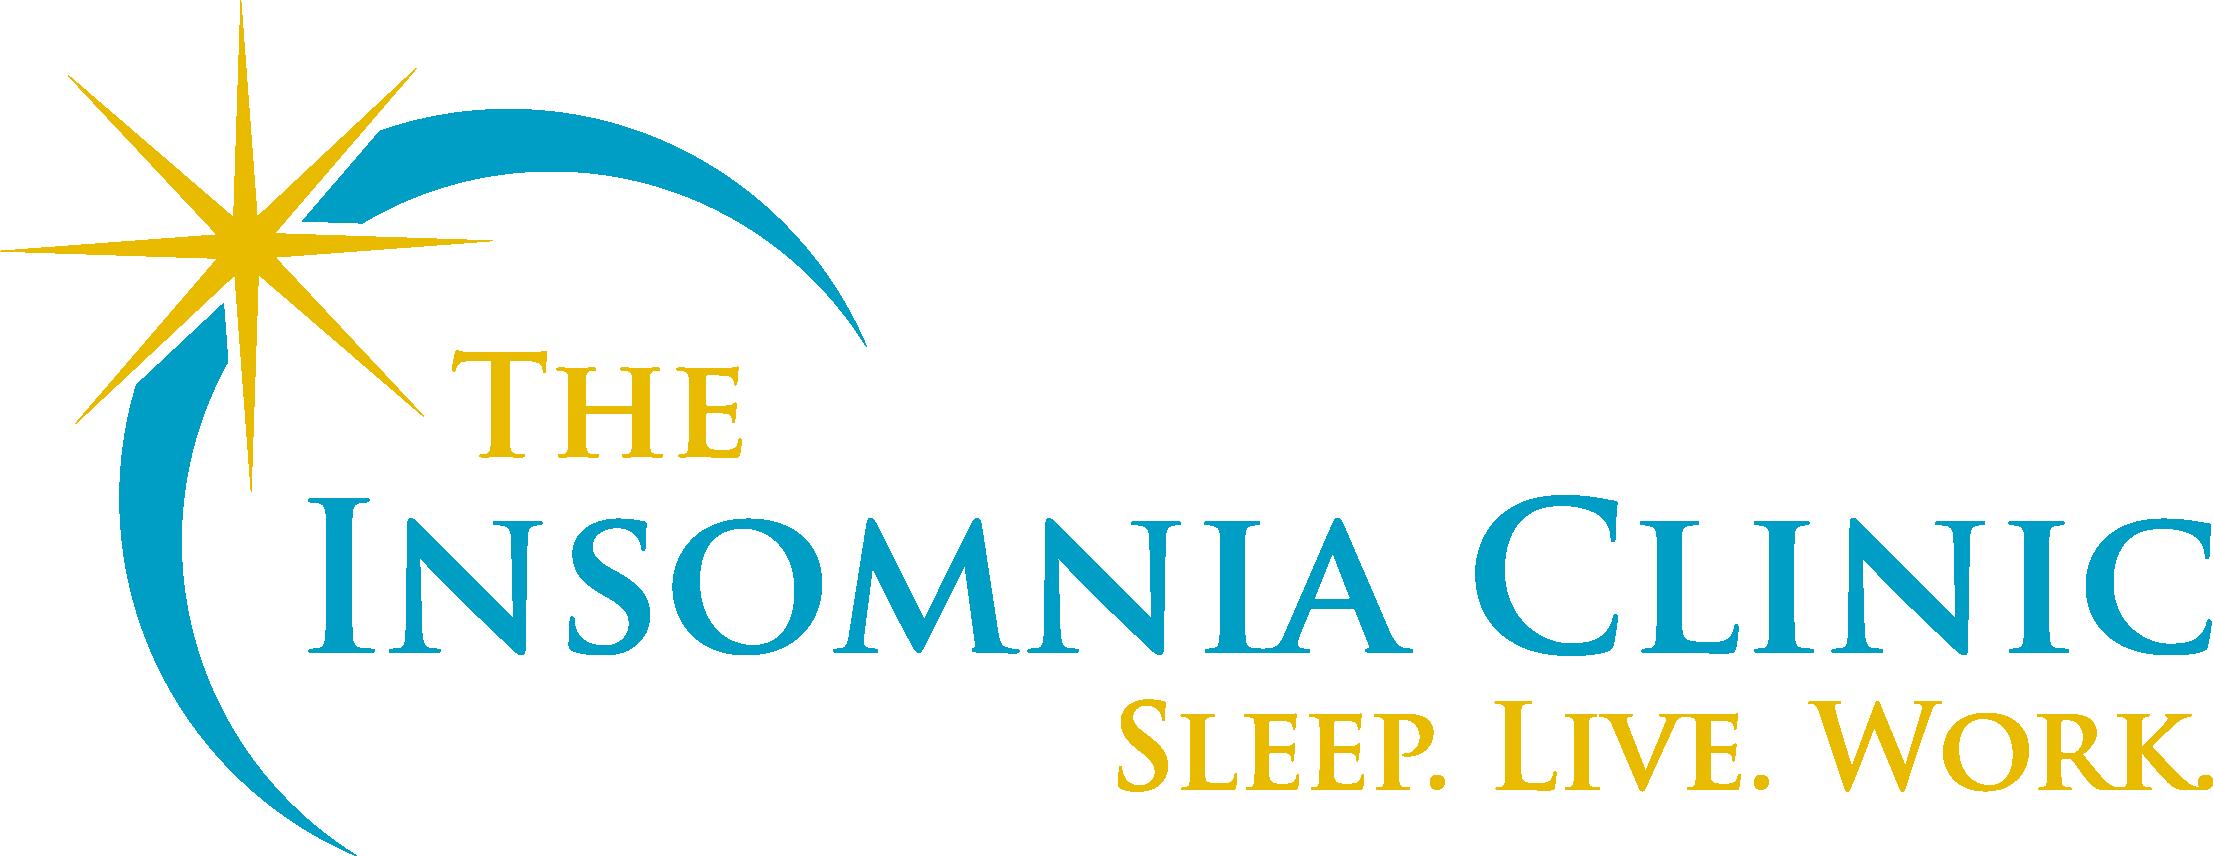 The Insomnia Clinic Logo